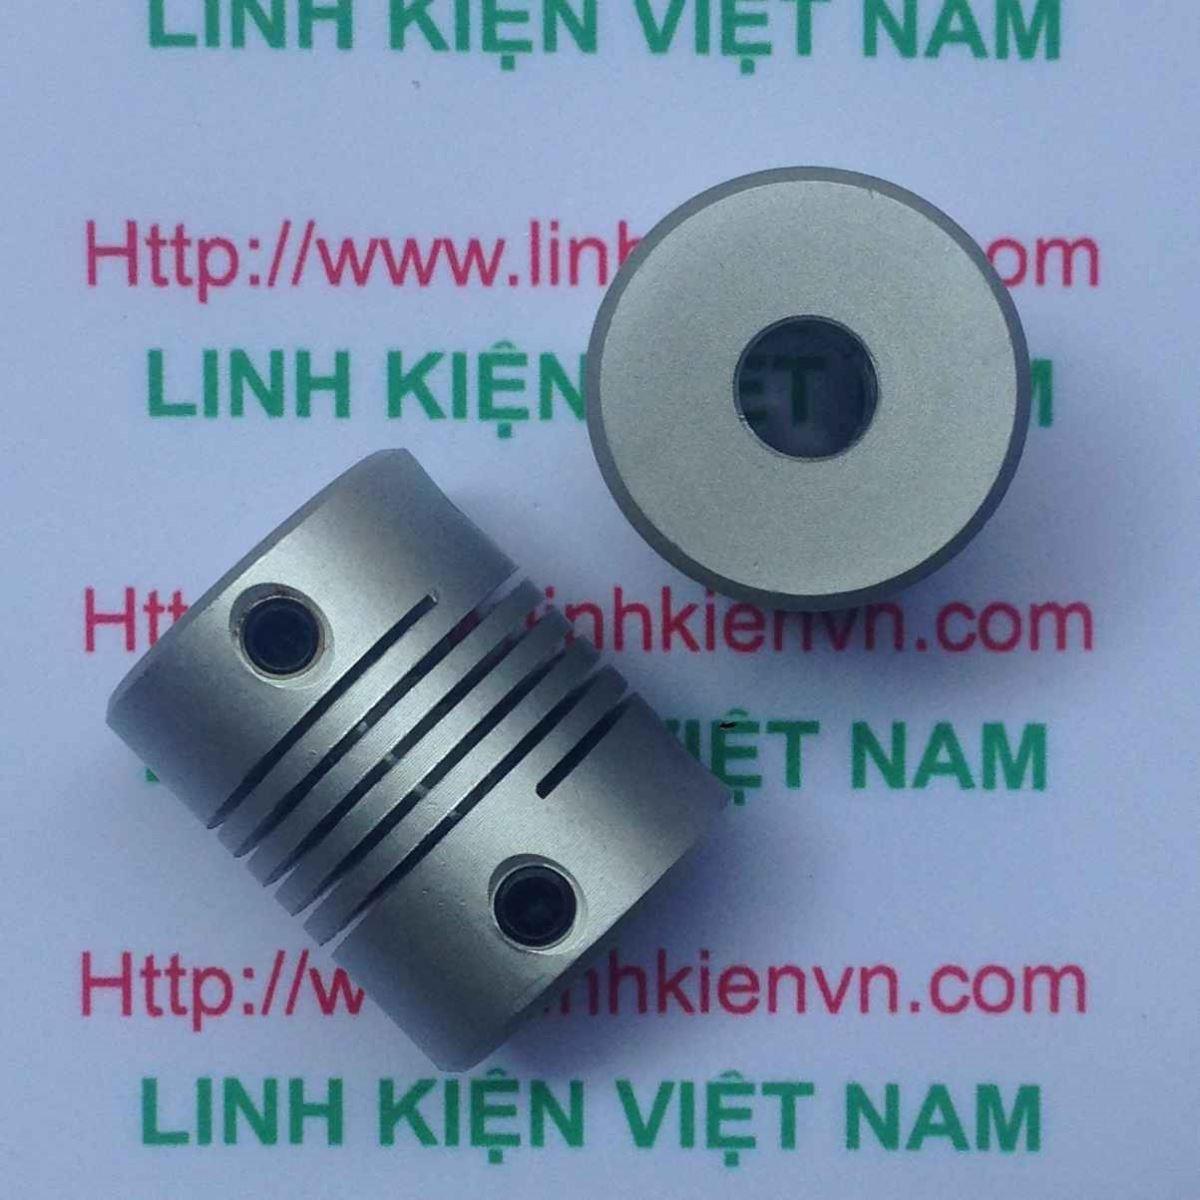 KHỚP NỐI ENCODER KIM LOẠI 6mm - 6mm - C1H16